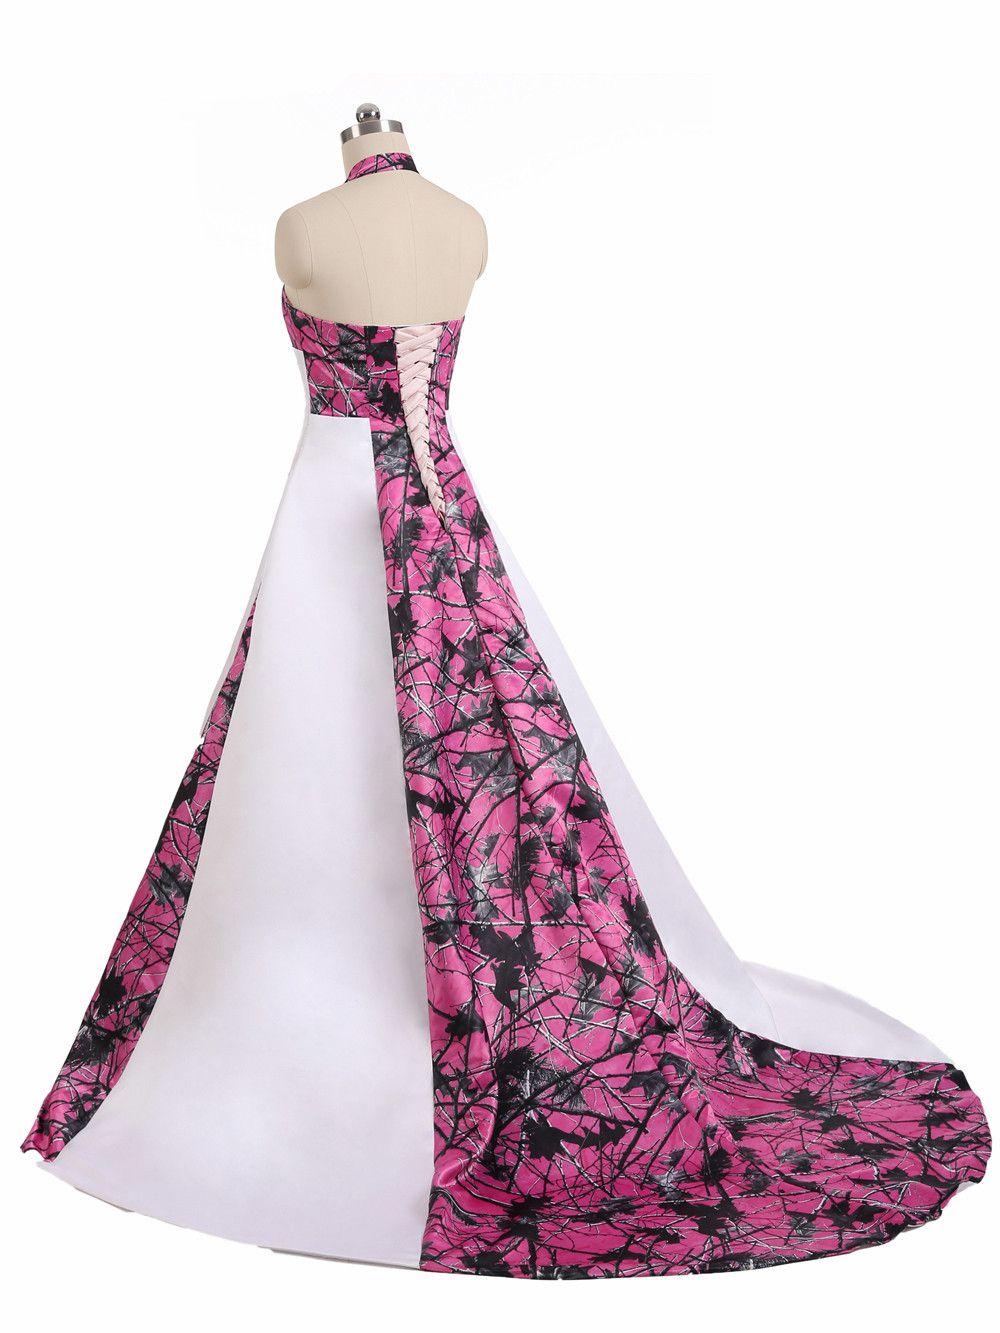 A-line Camo Wedding Dresses Gowns Lace-up Back Plus Size Halter Corset  Country Camo Bridal Dresses Gowns Plus Size